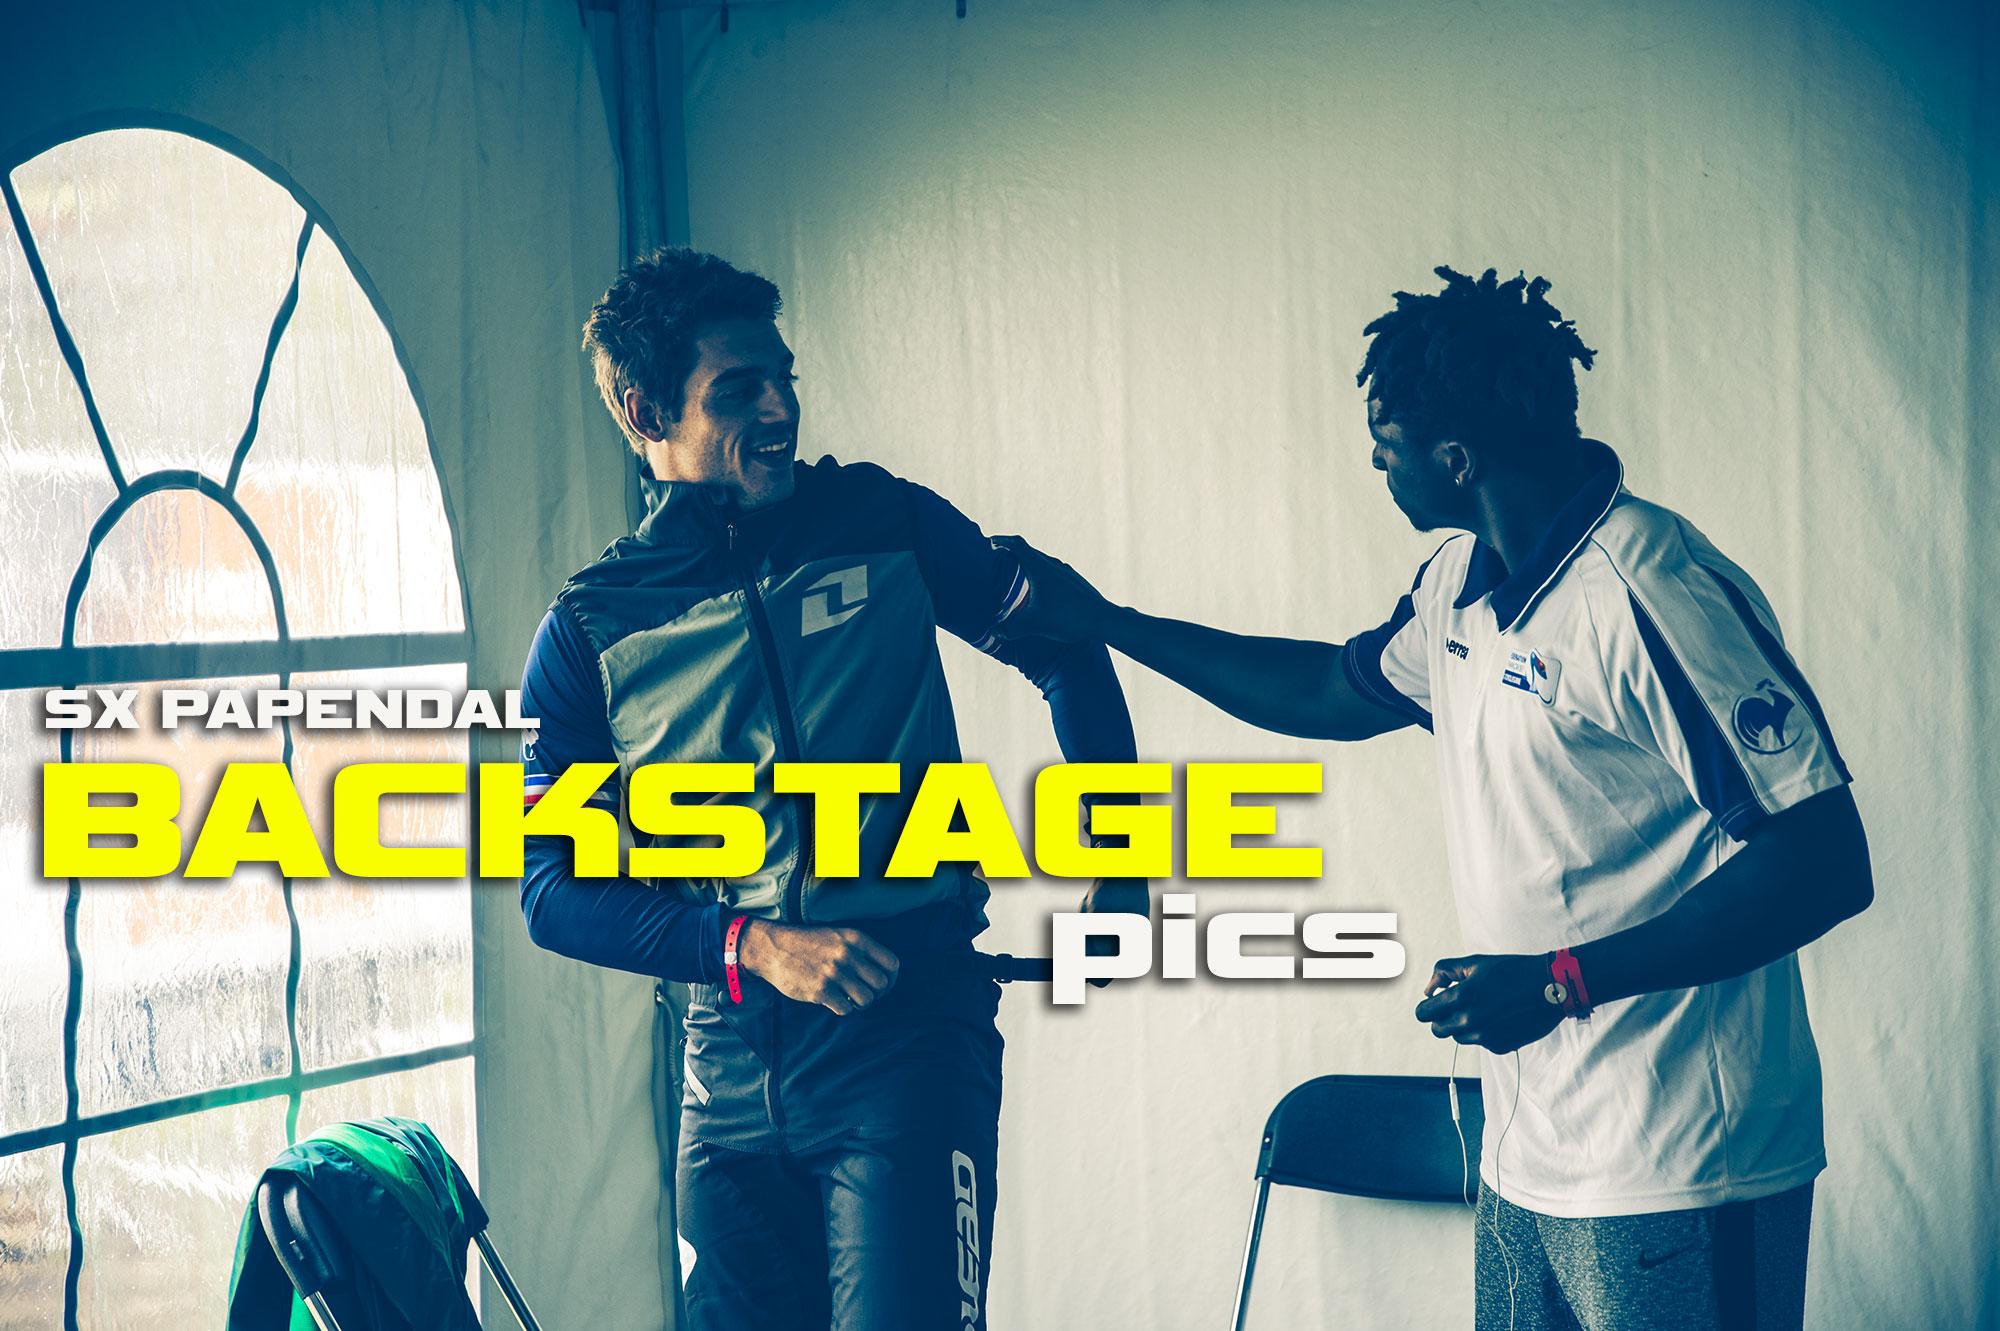 UCI SX BMX PAPENDAL BACKSTAGE